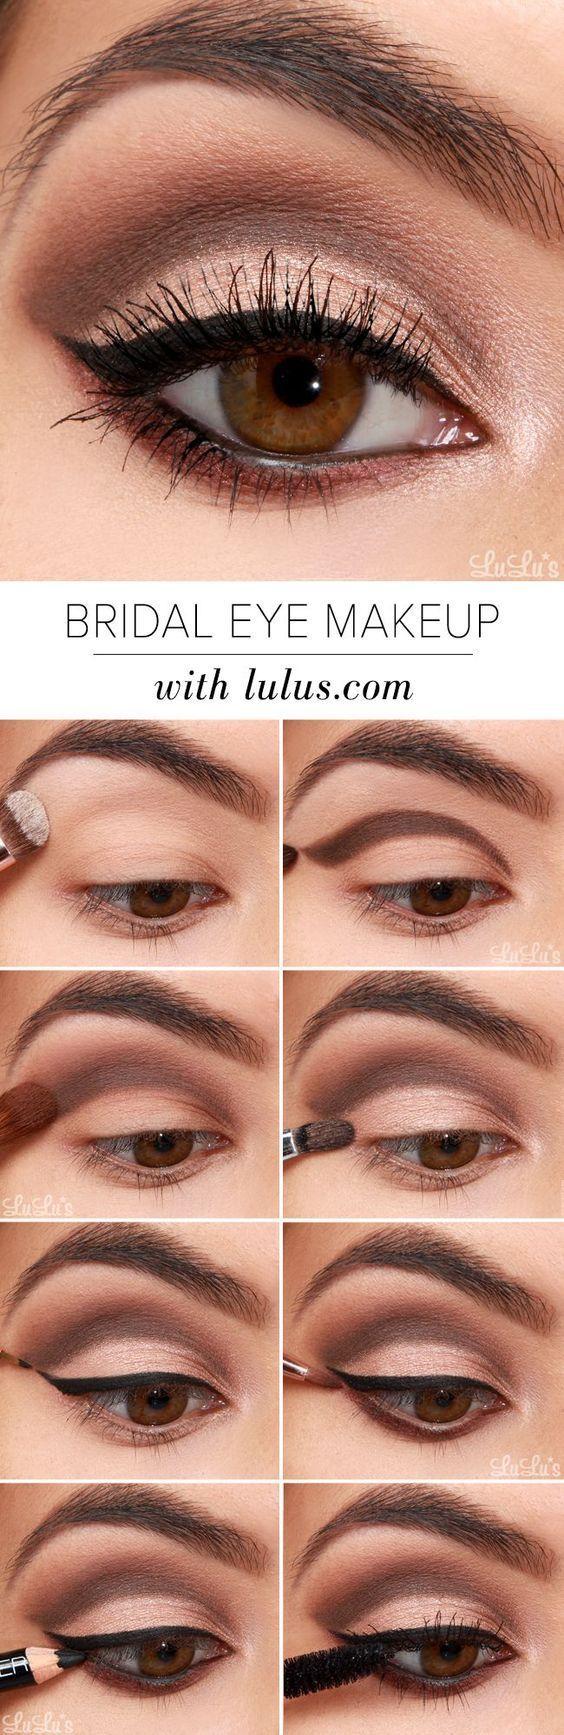 Beauty Gorgeous Bridal Makeup Tutorial